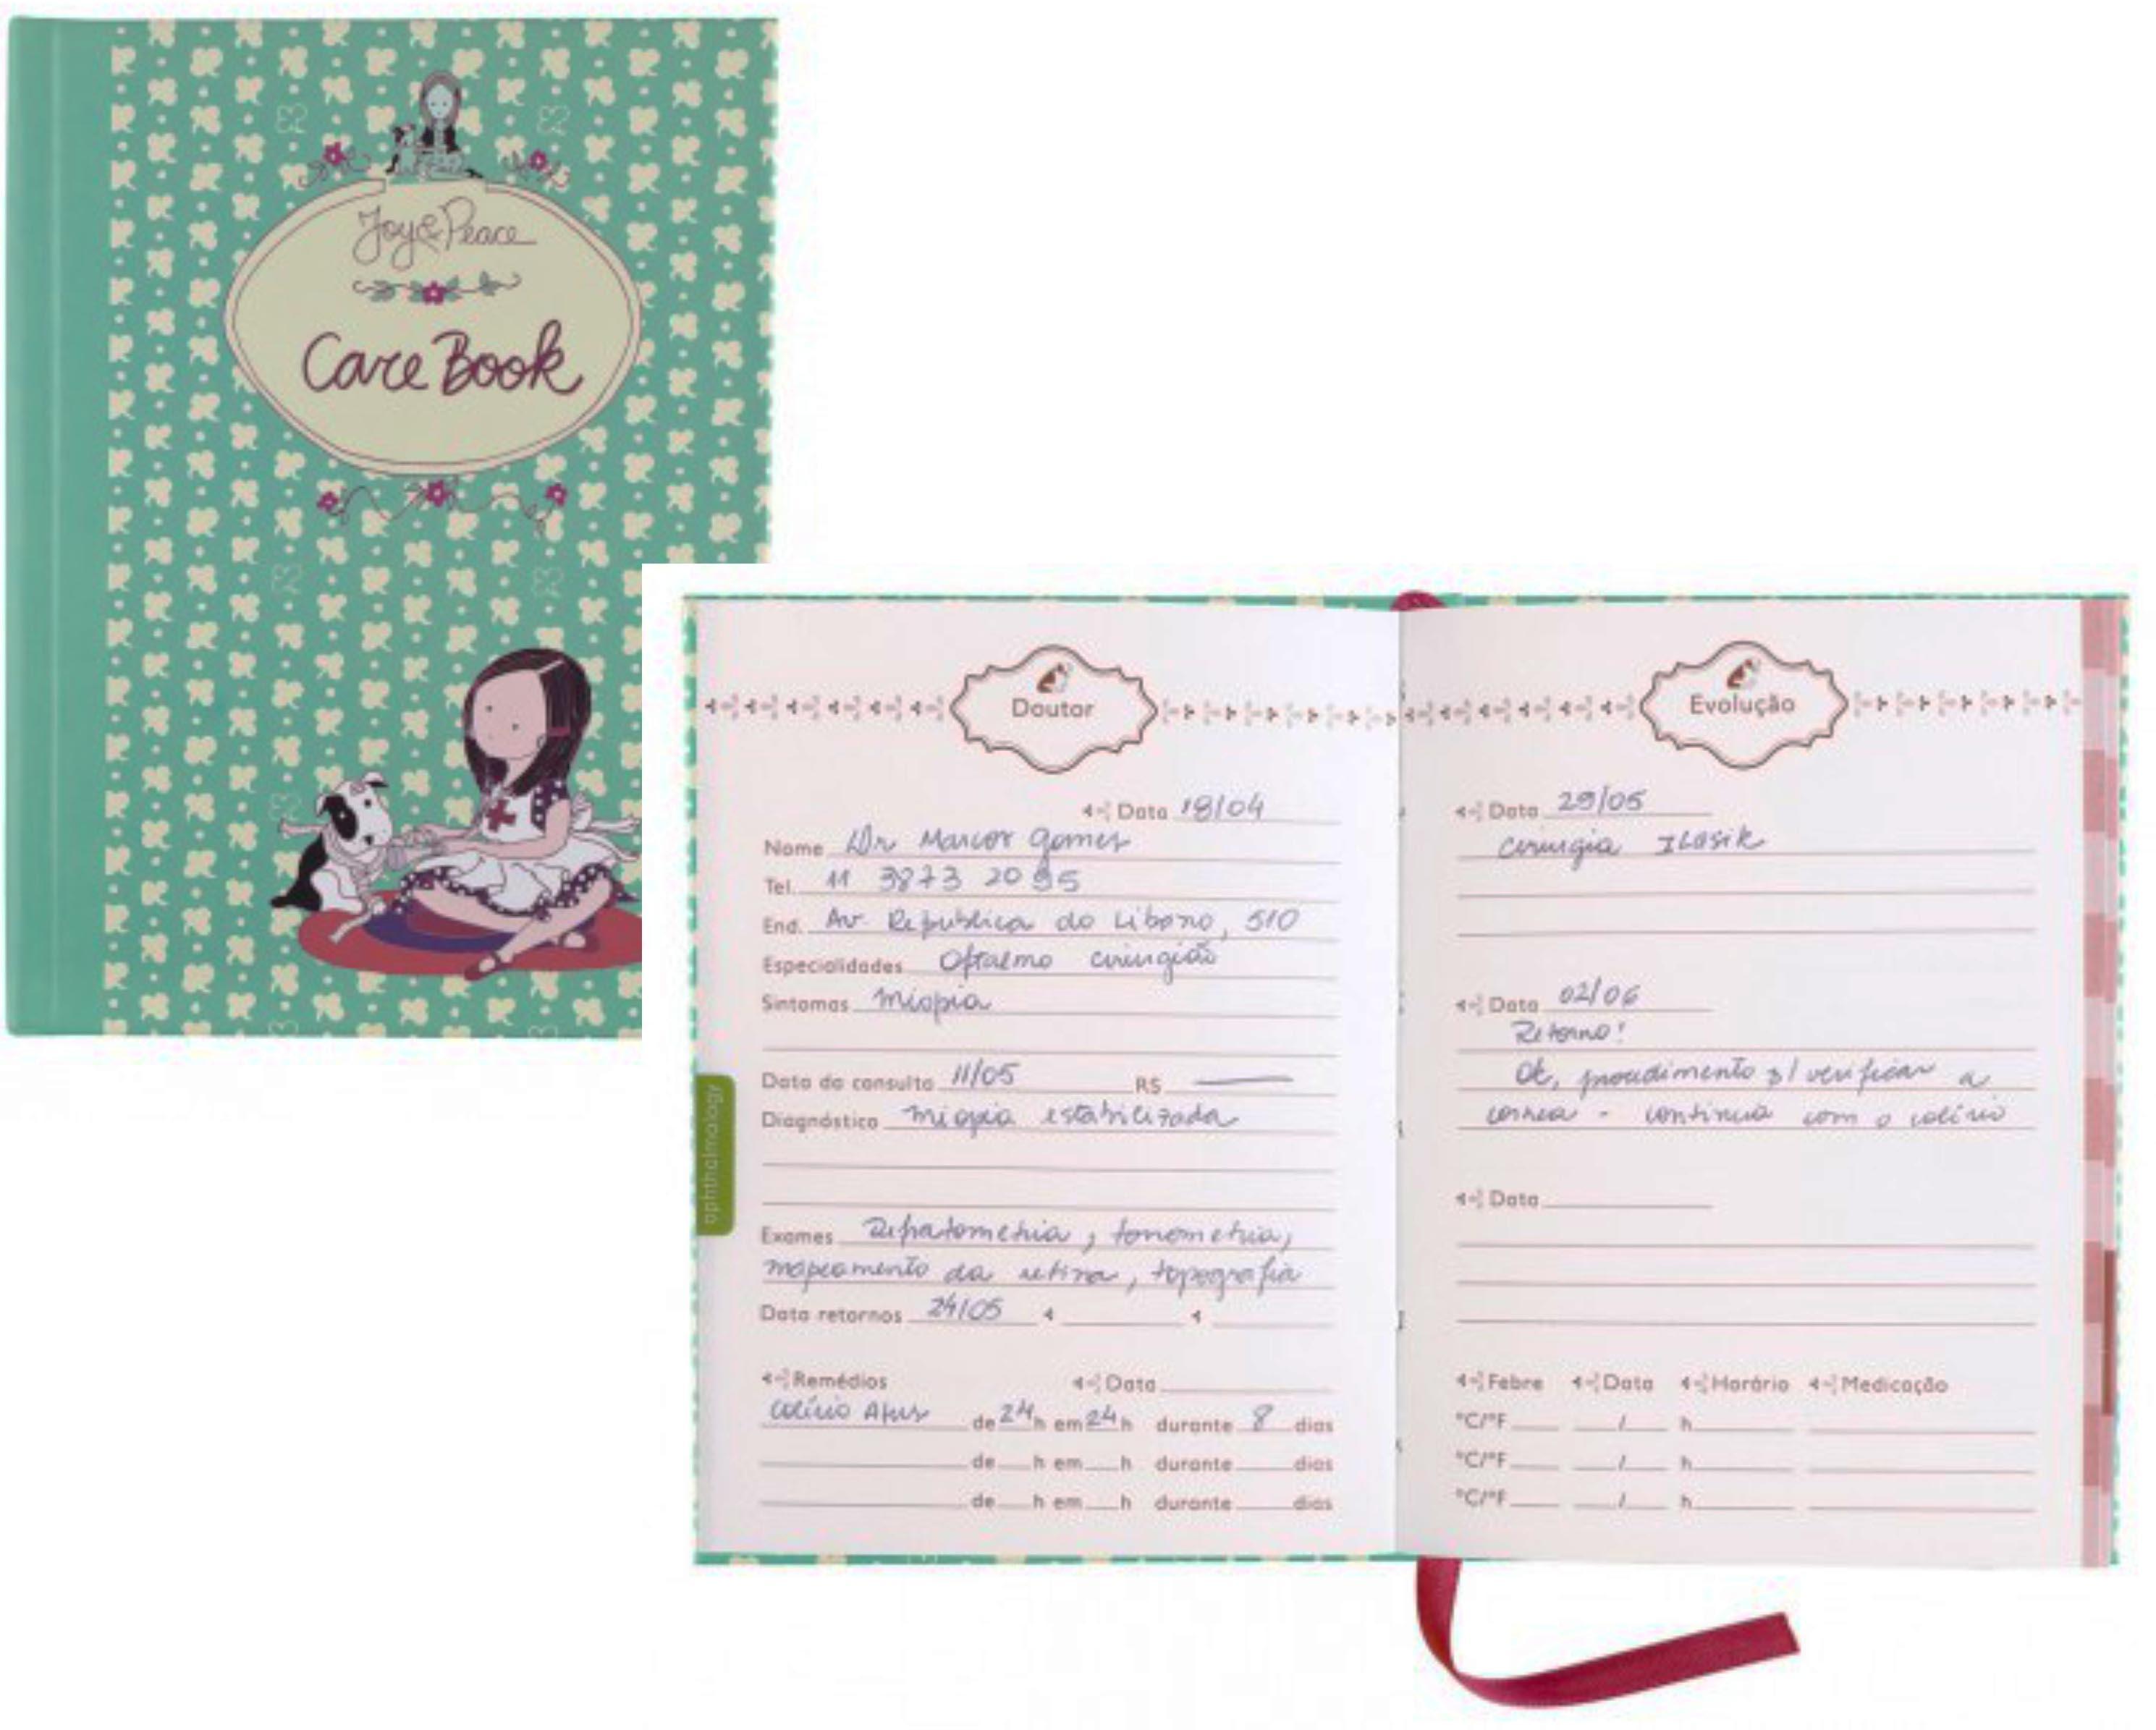 Caderno de consultas médicas